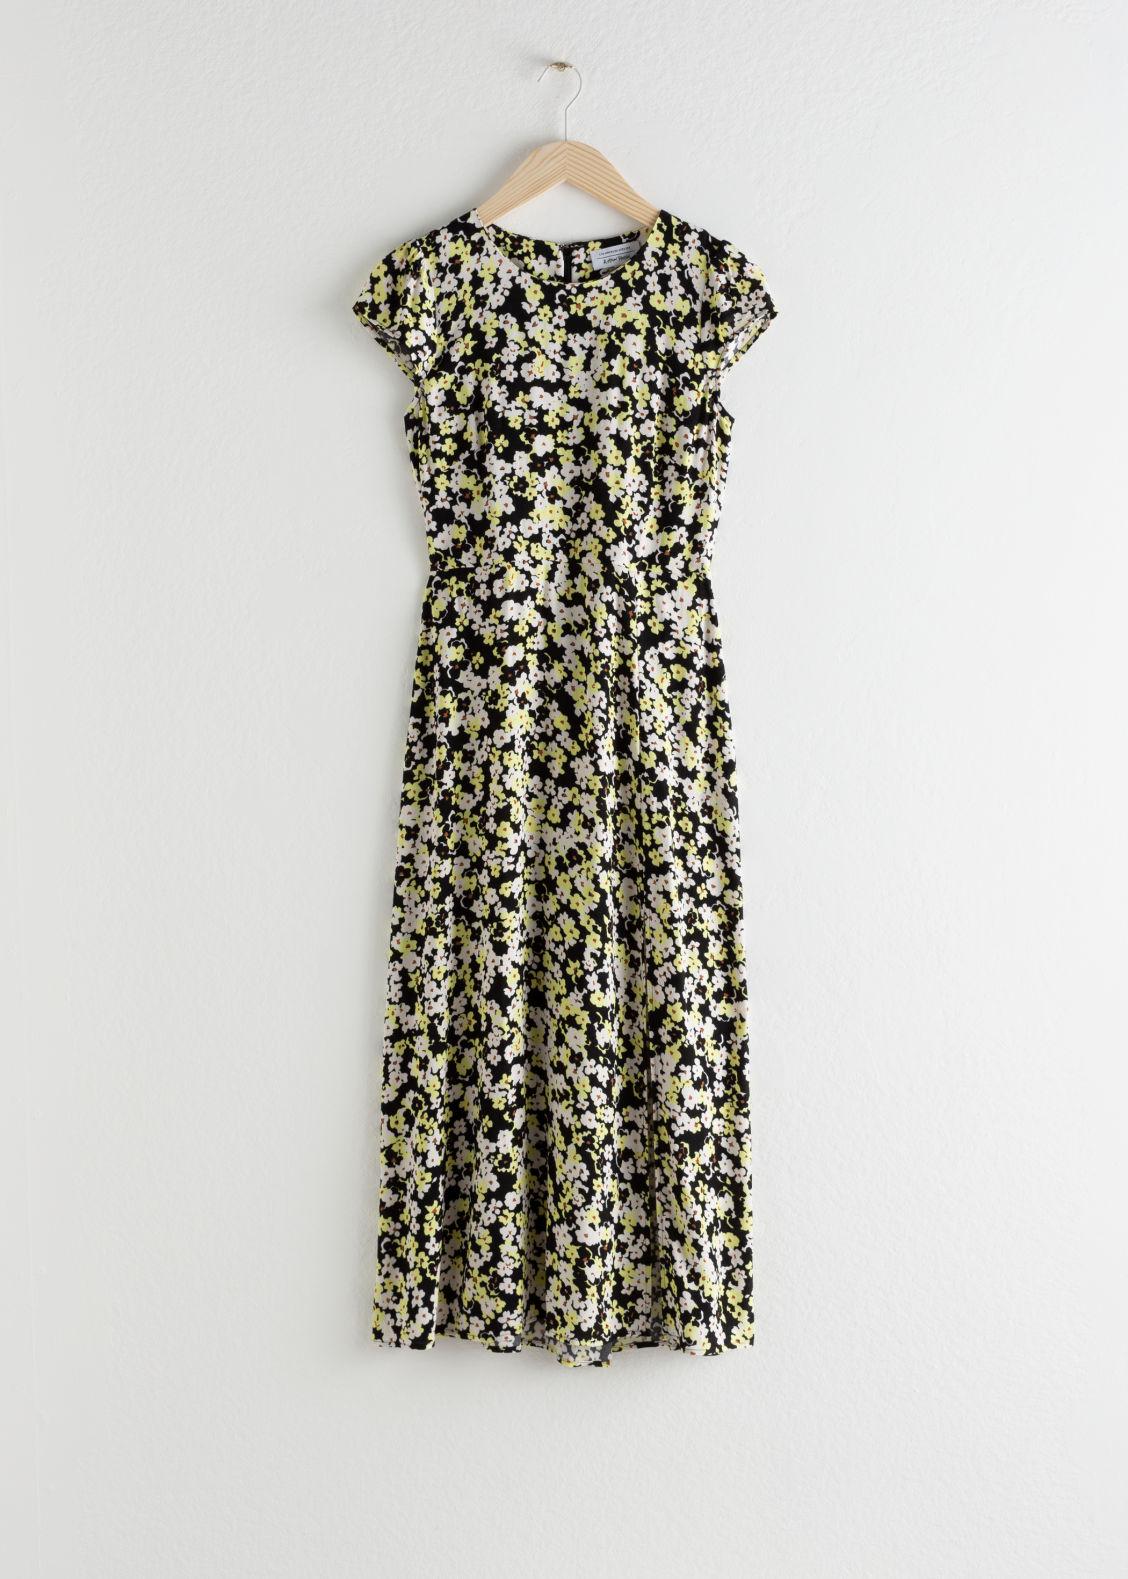 Floral Midi Dress Floral Midi dresses & Other Stories